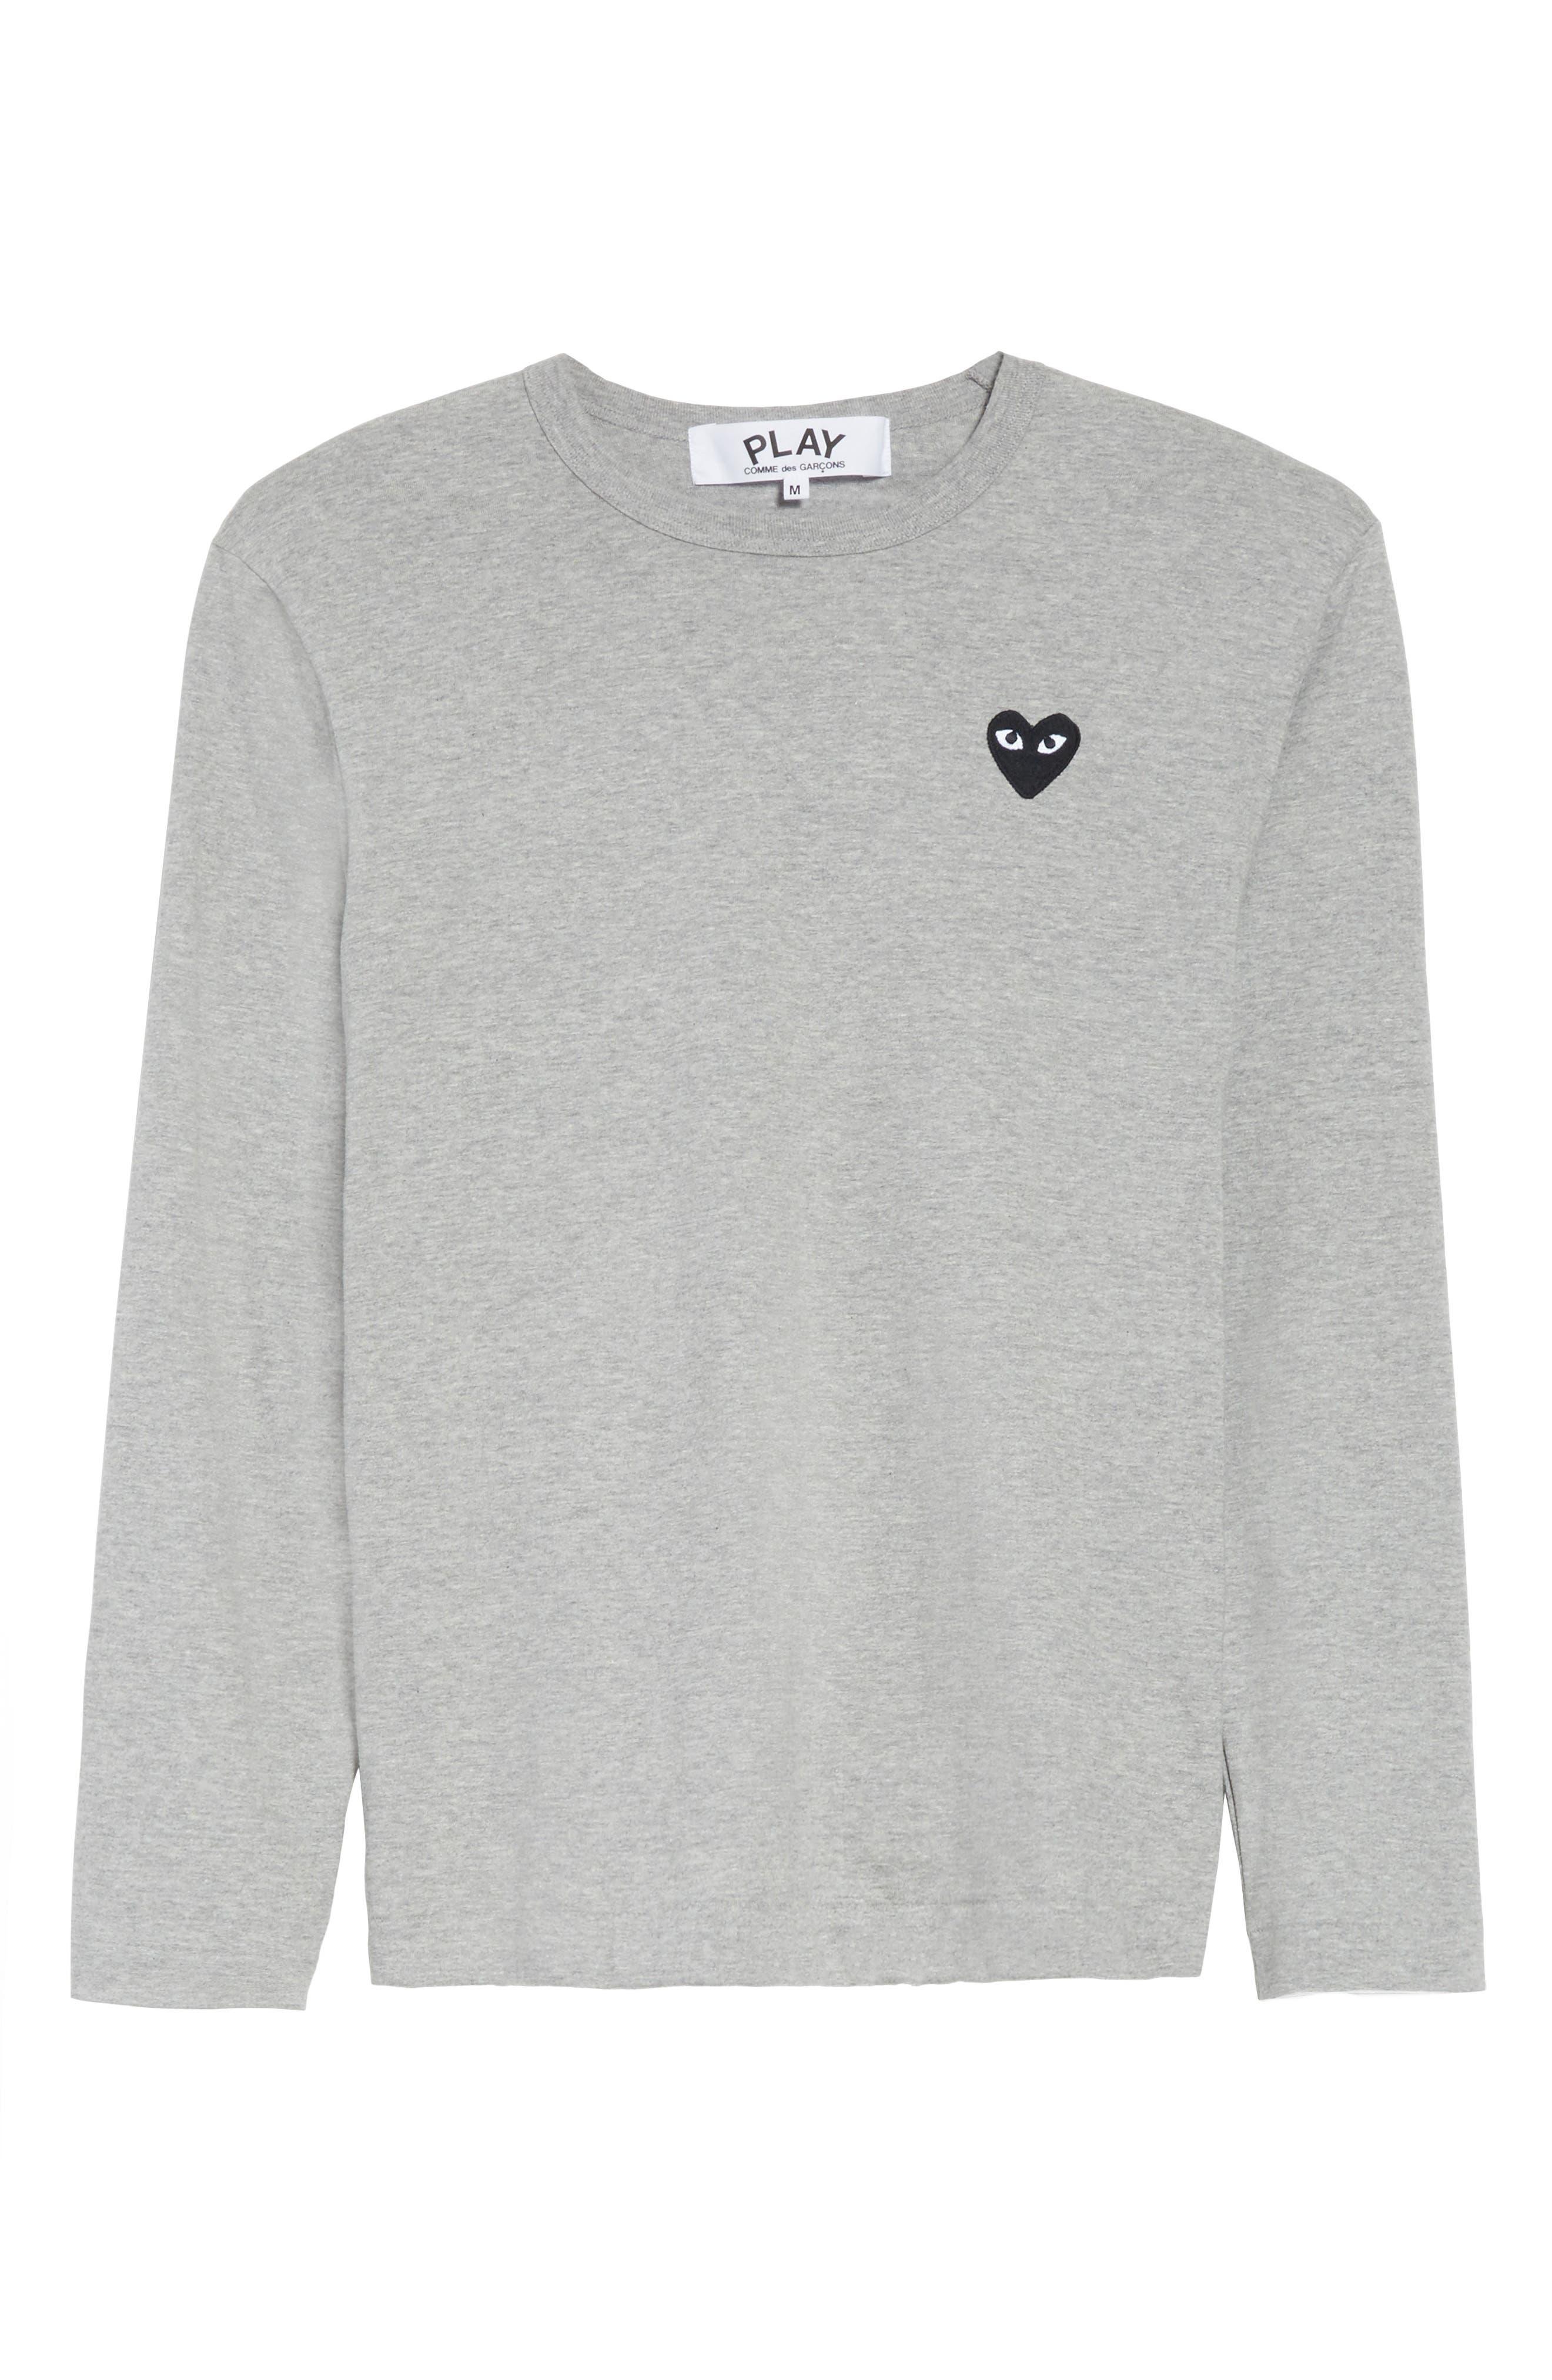 PLAY Long Sleeve T-Shirt,                             Alternate thumbnail 6, color,                             Grey